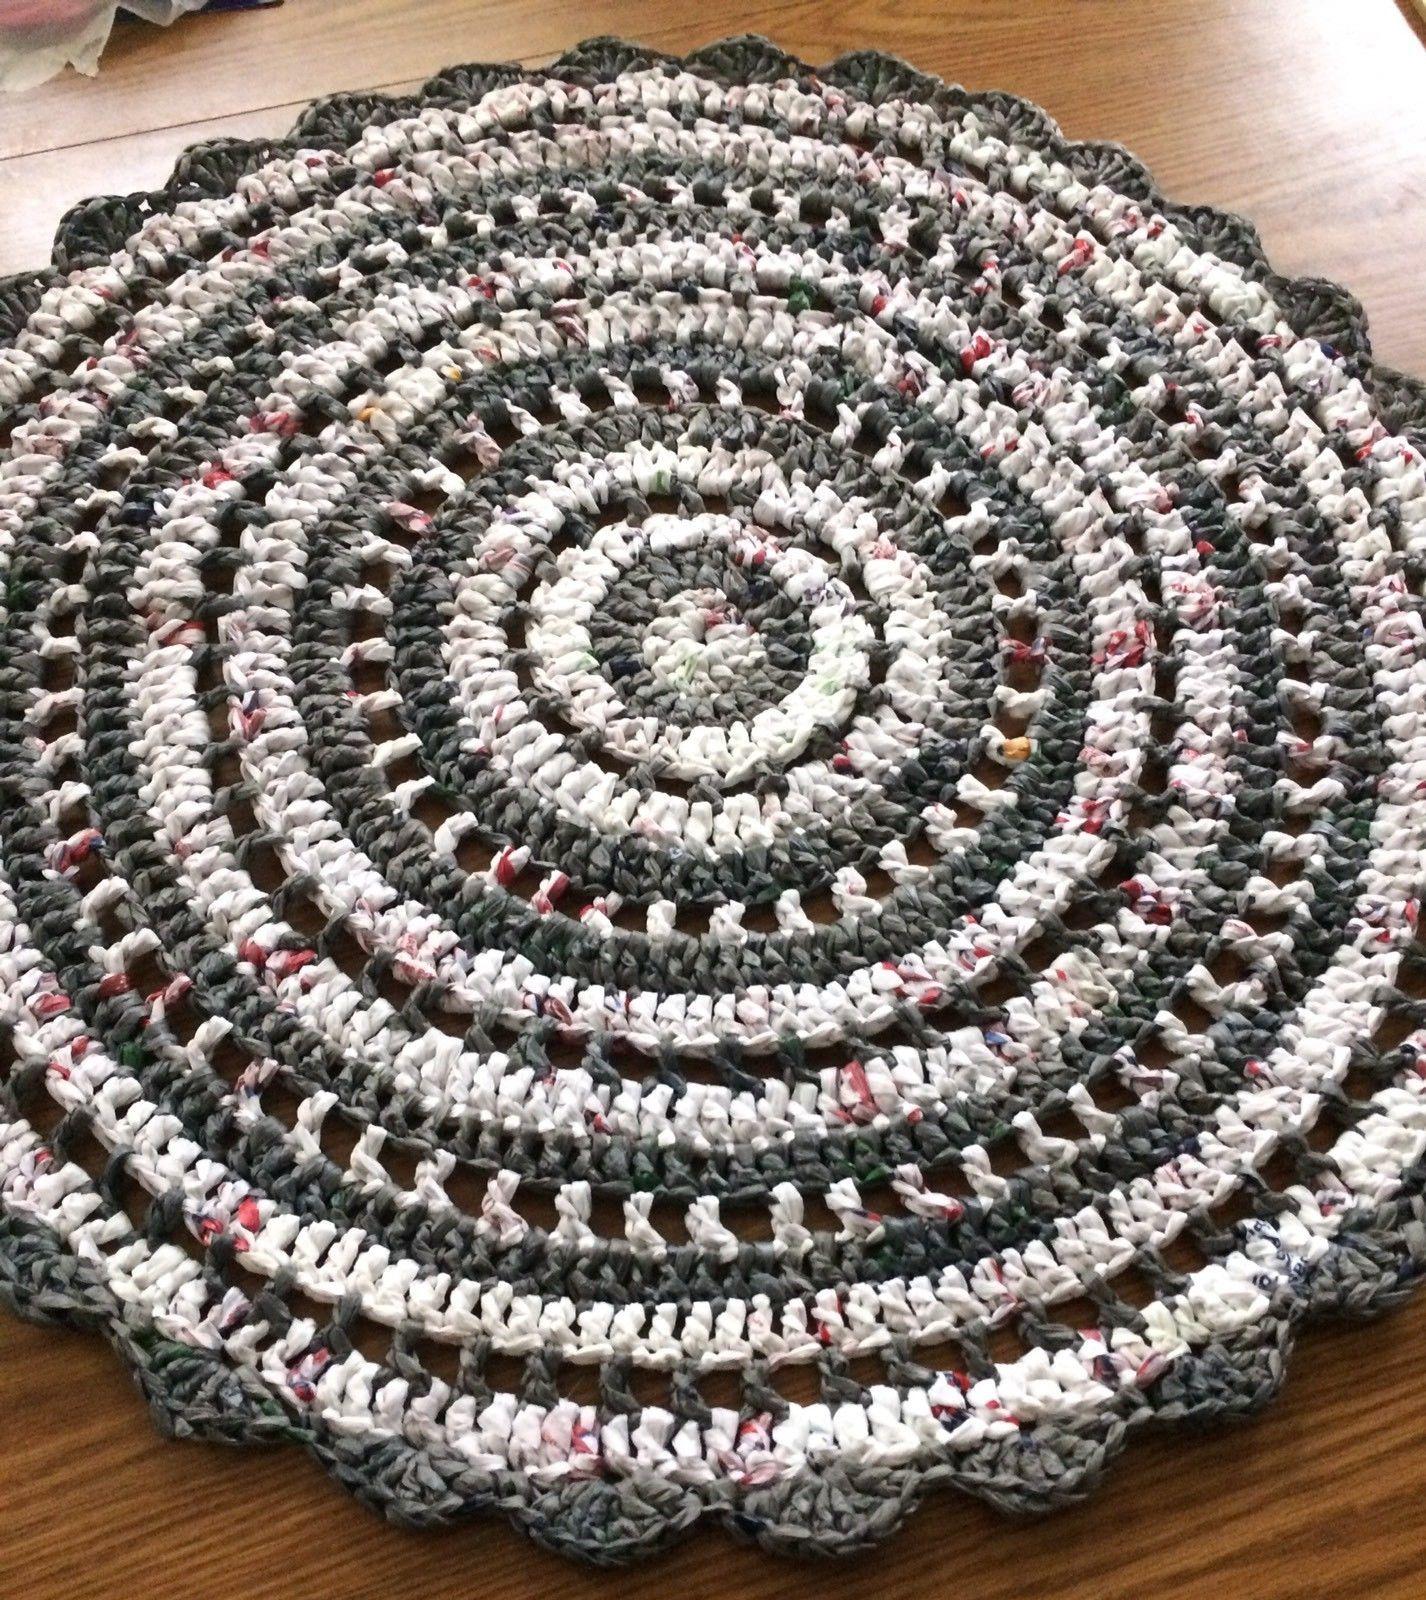 New Upcycled Recycled Plastic Plarn Crochet Round Rug Mat 30 Indoor Outdoor Plastic Bag Crochet Plastic Bag Crafts Crochet Round